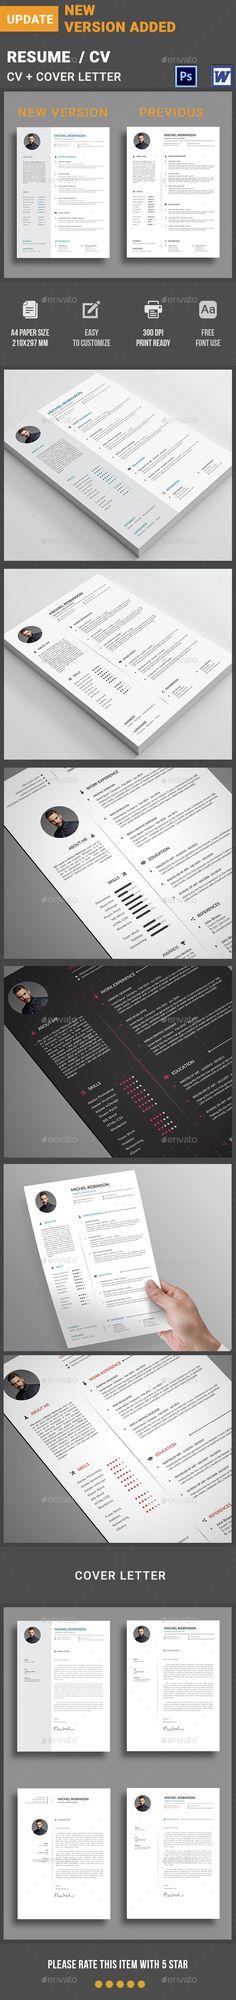 Resume Template, Resume cv and Cv resume template